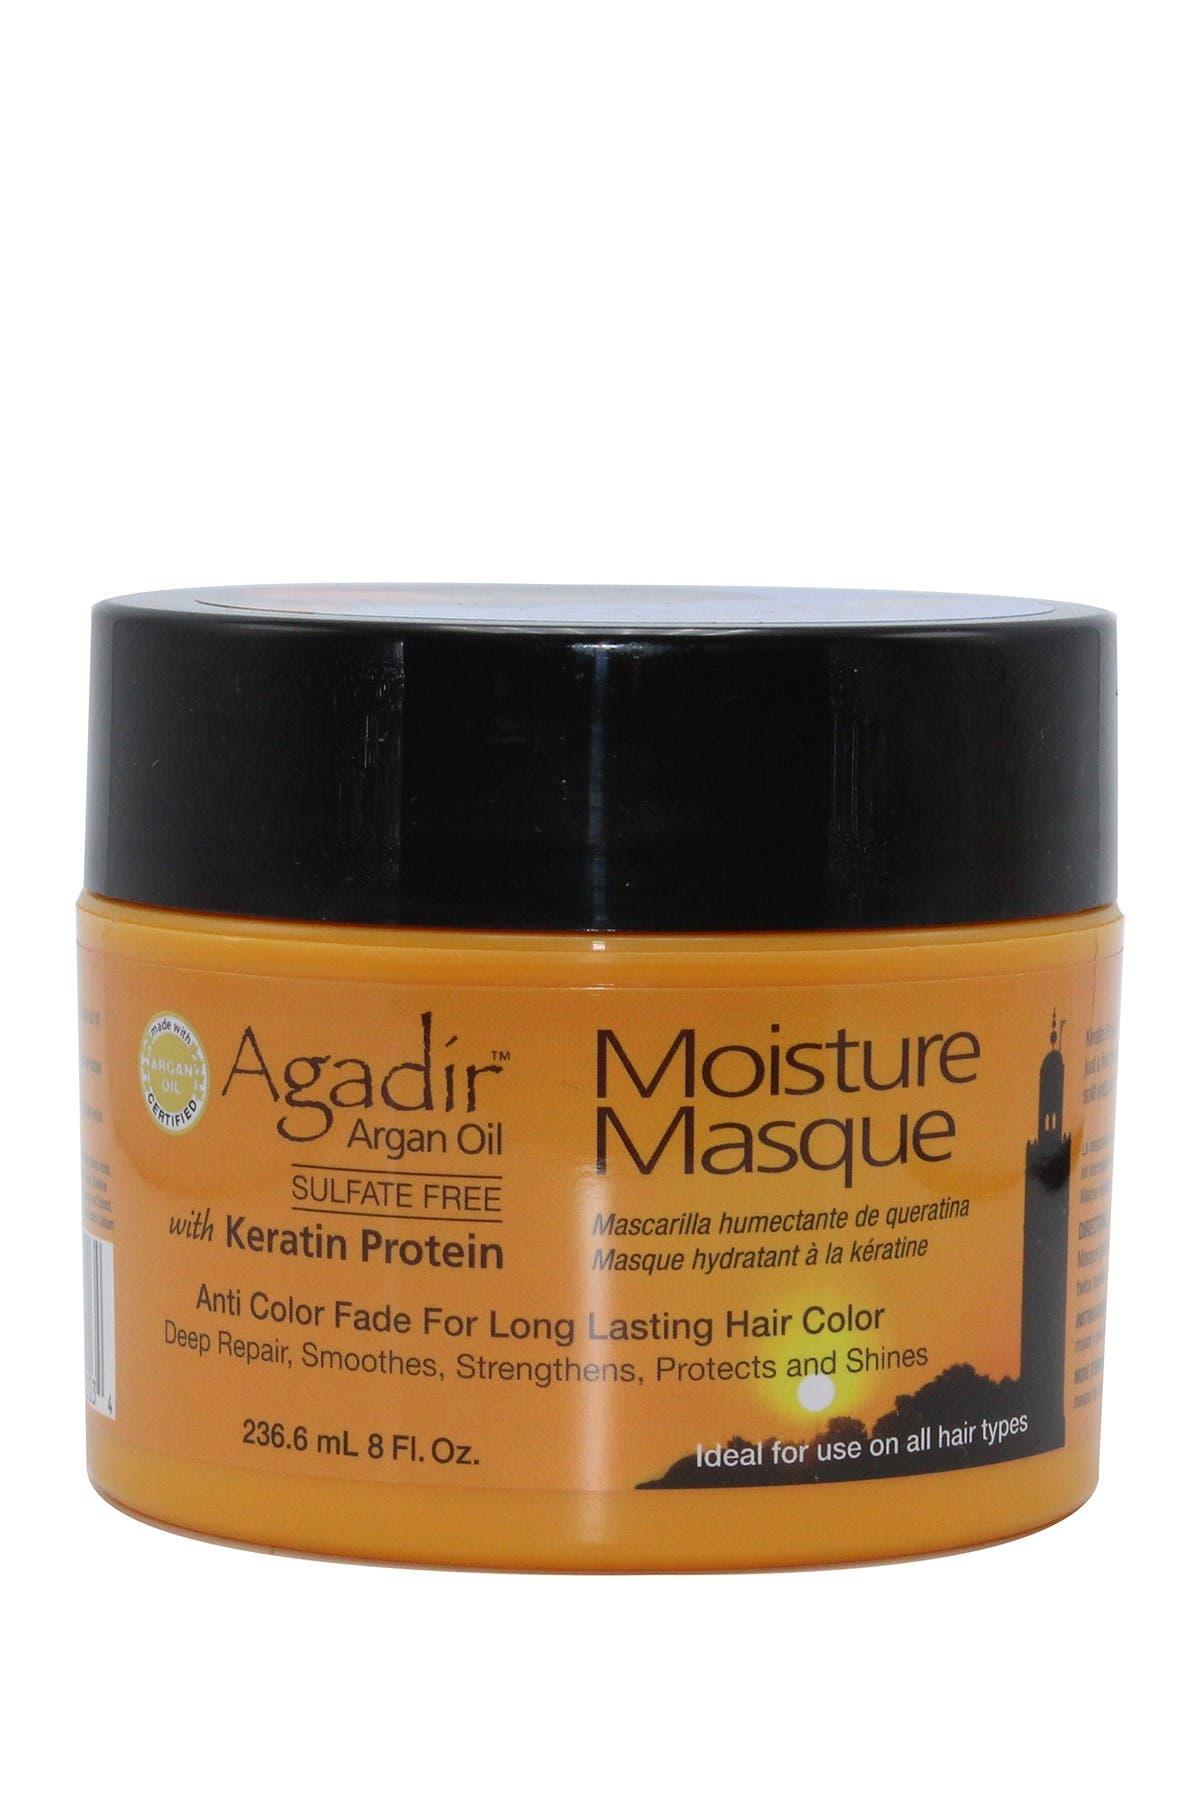 Image of Agadir Argan Oil Moisture Hair Masque - 8 oz.